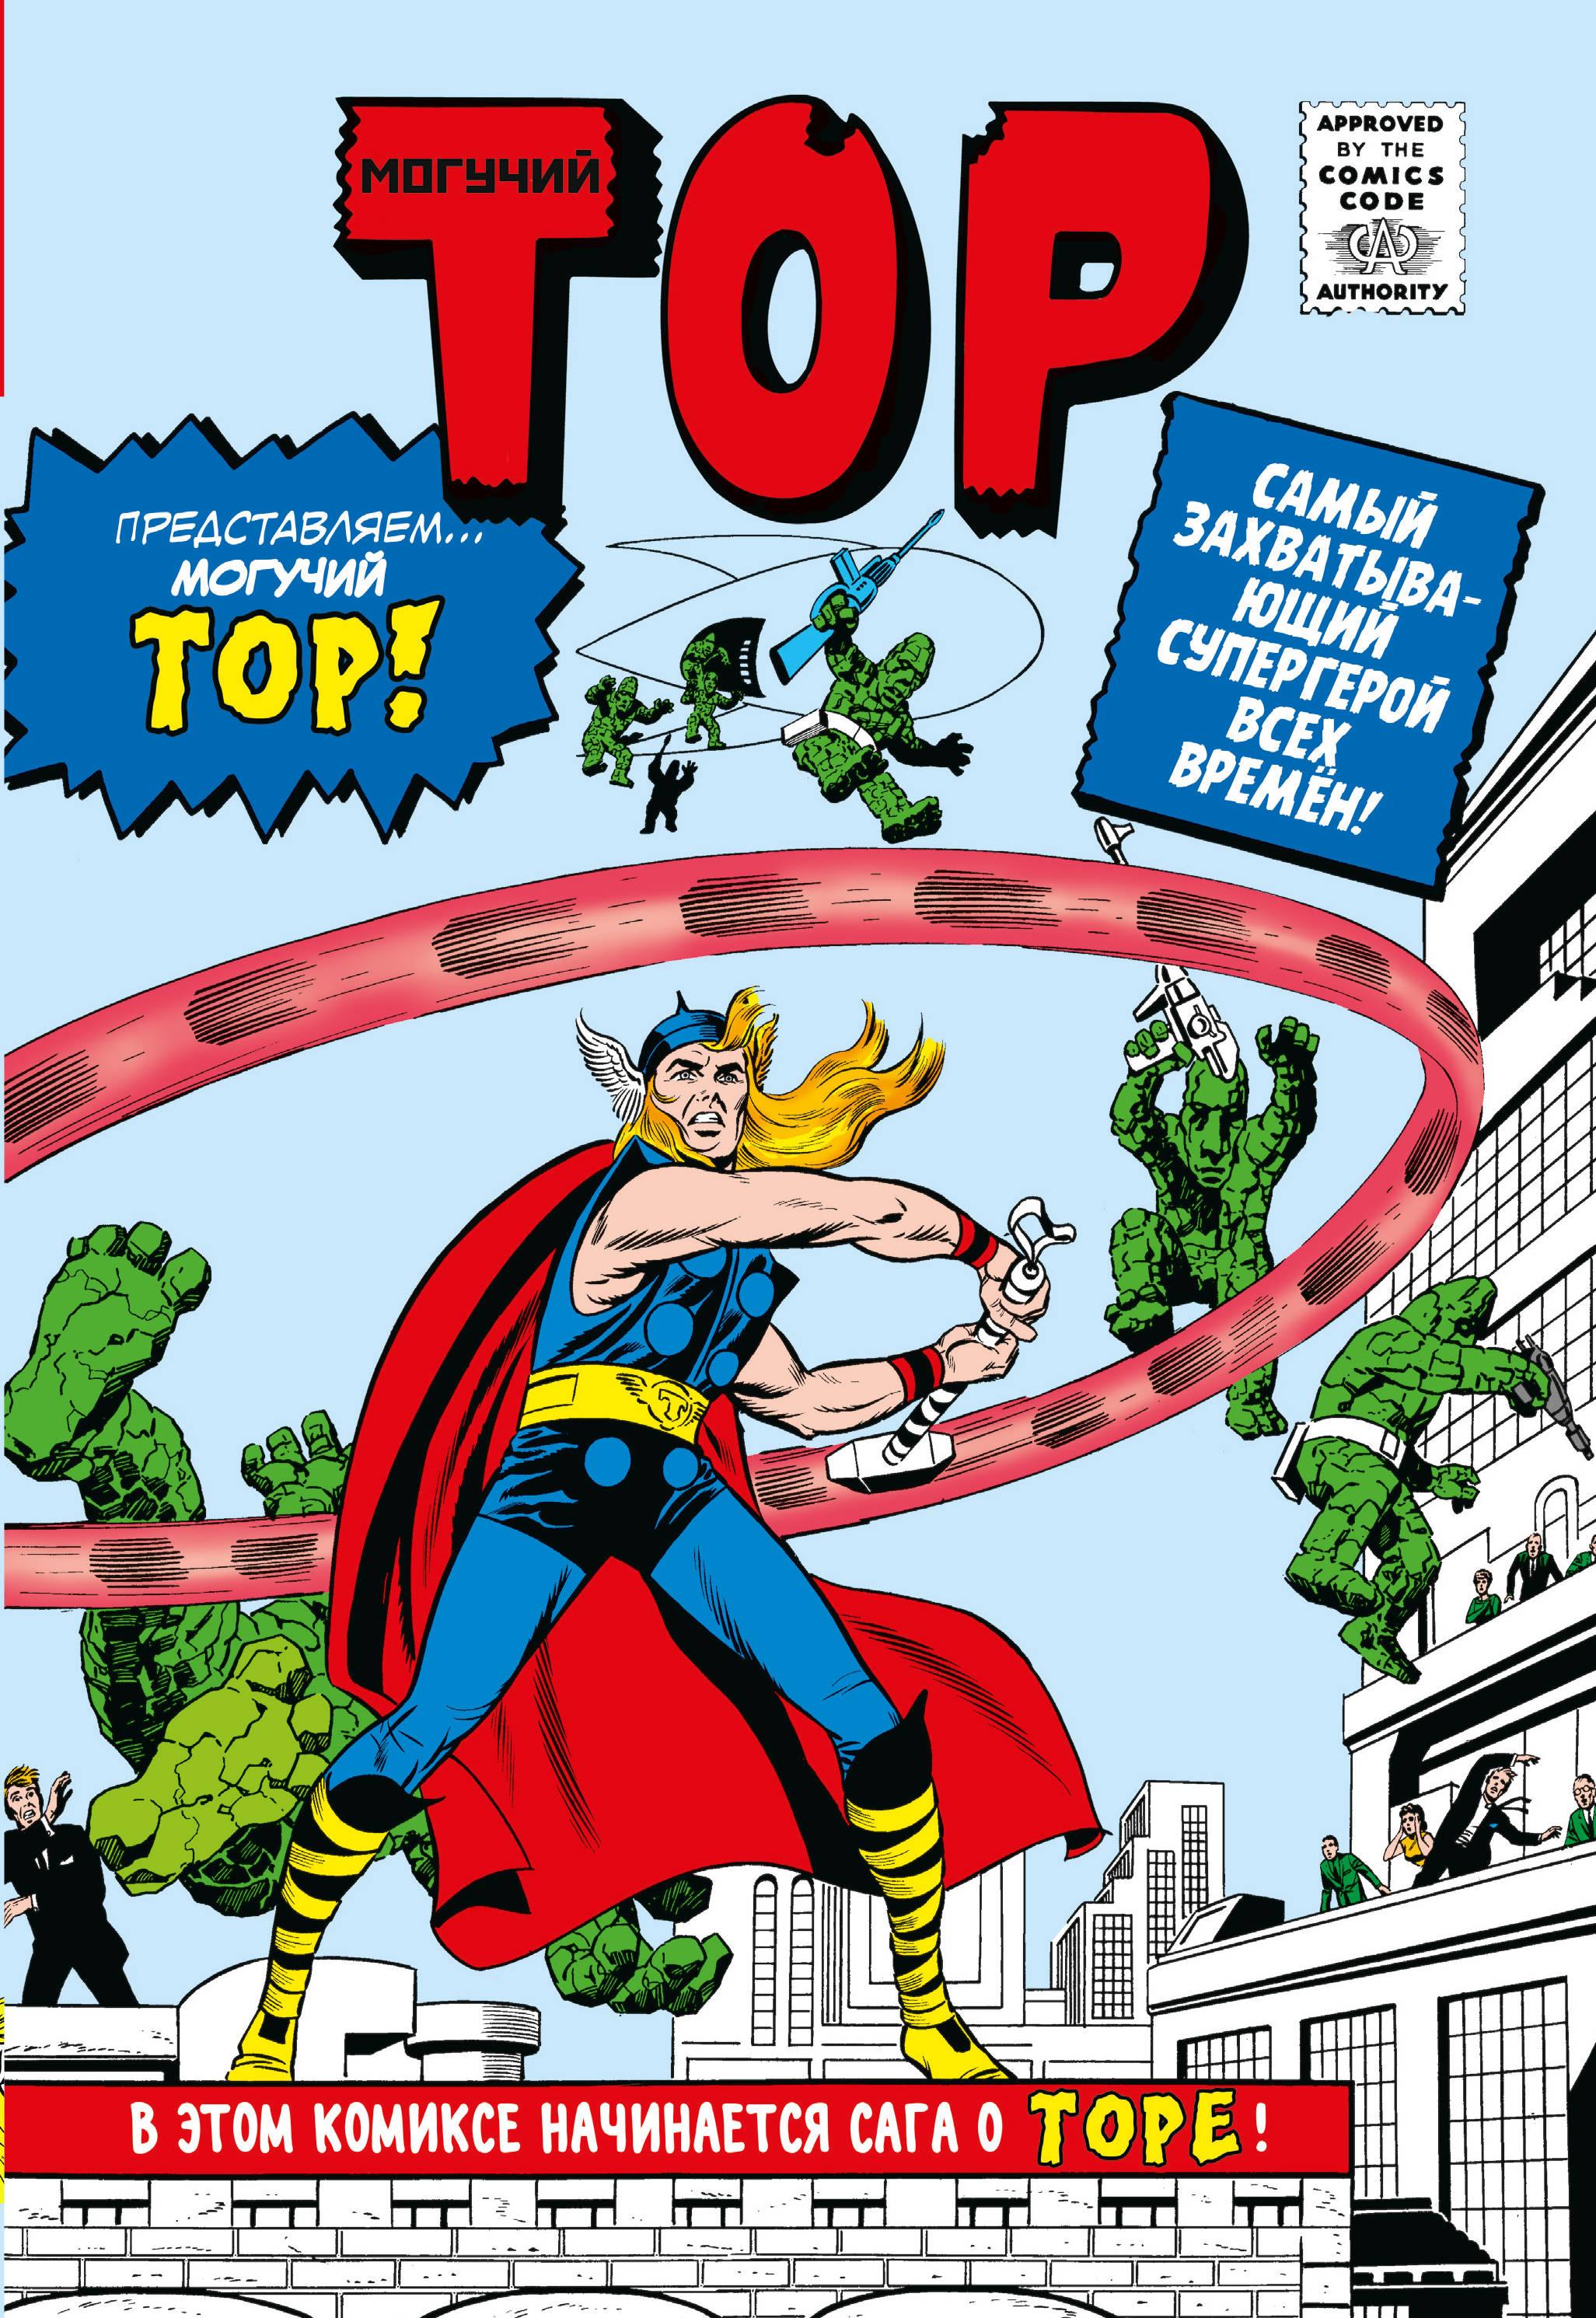 Klassika Marvel. Moguchij Tor